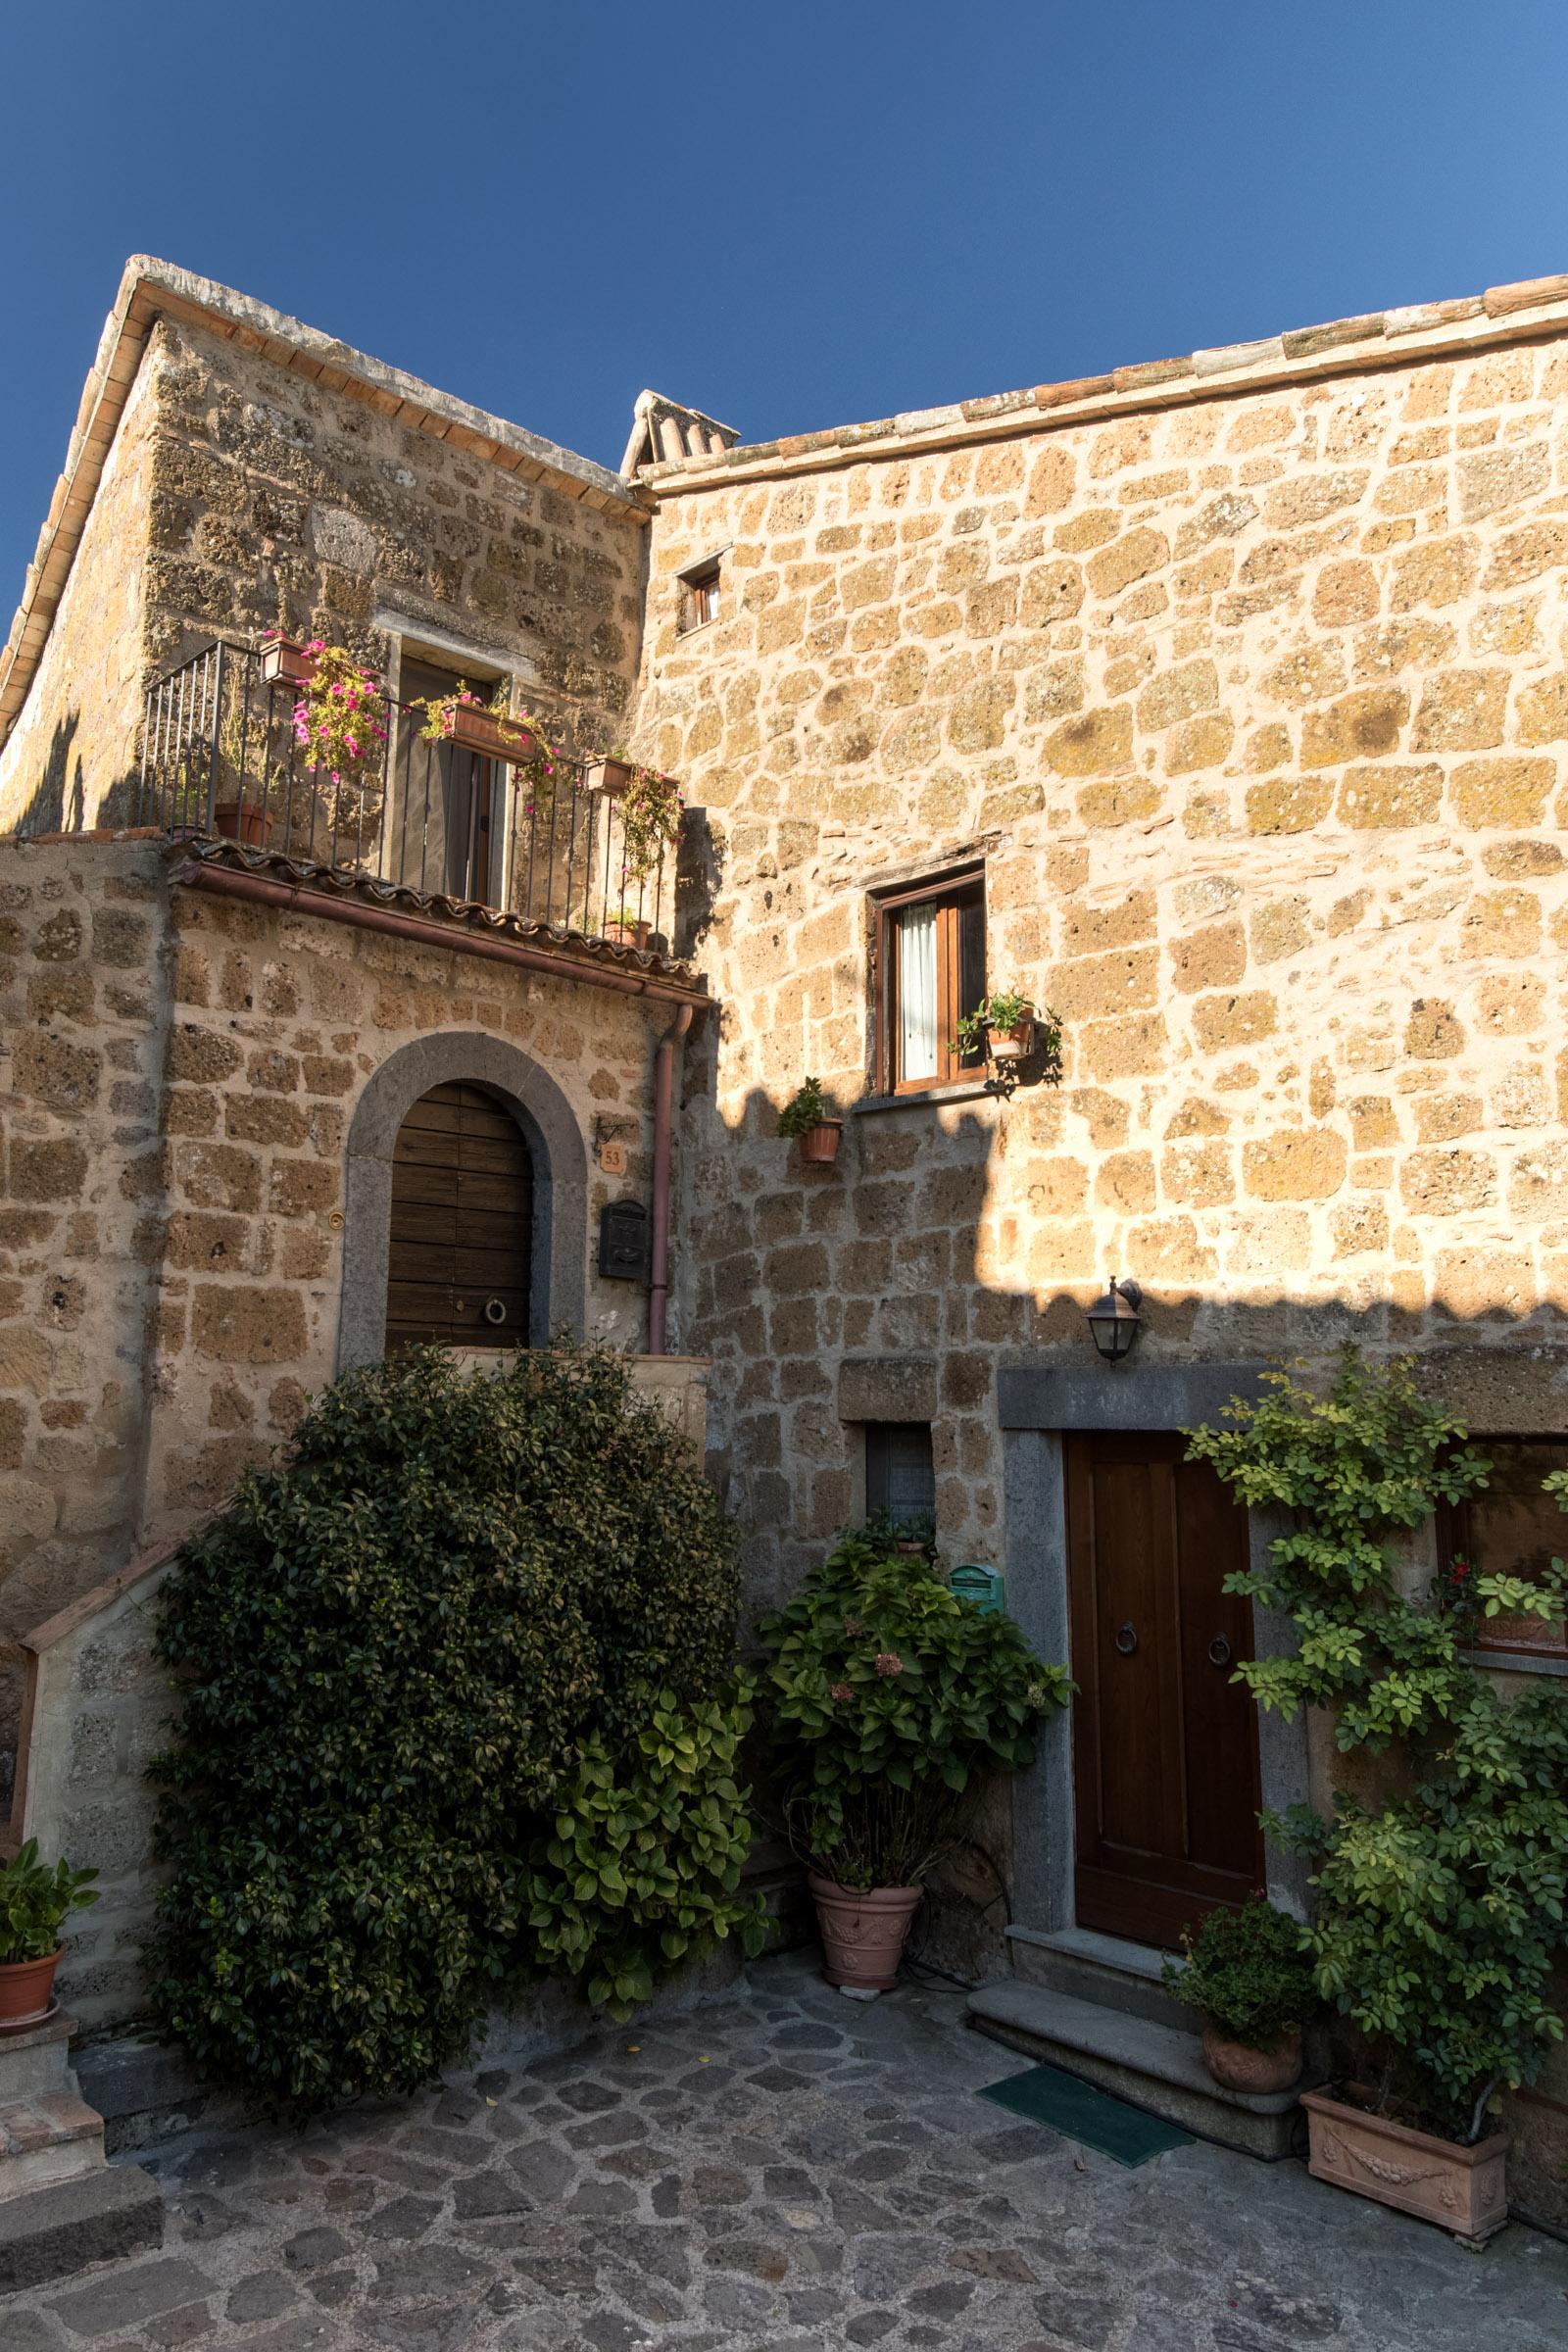 Civita di Bagnoregio, Umbria, Italy | Reid Burchell Photography